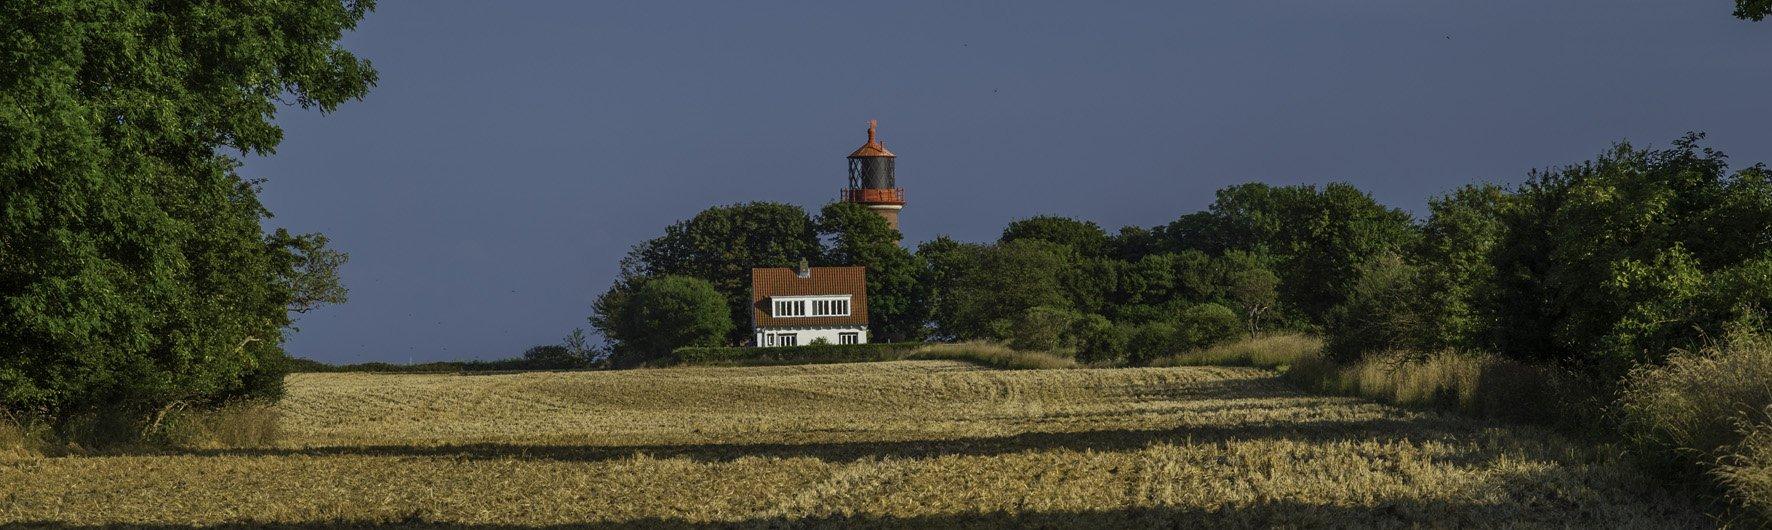 Flügger Leuchtturm - Fehmarn, foto: h.dietrich habbe